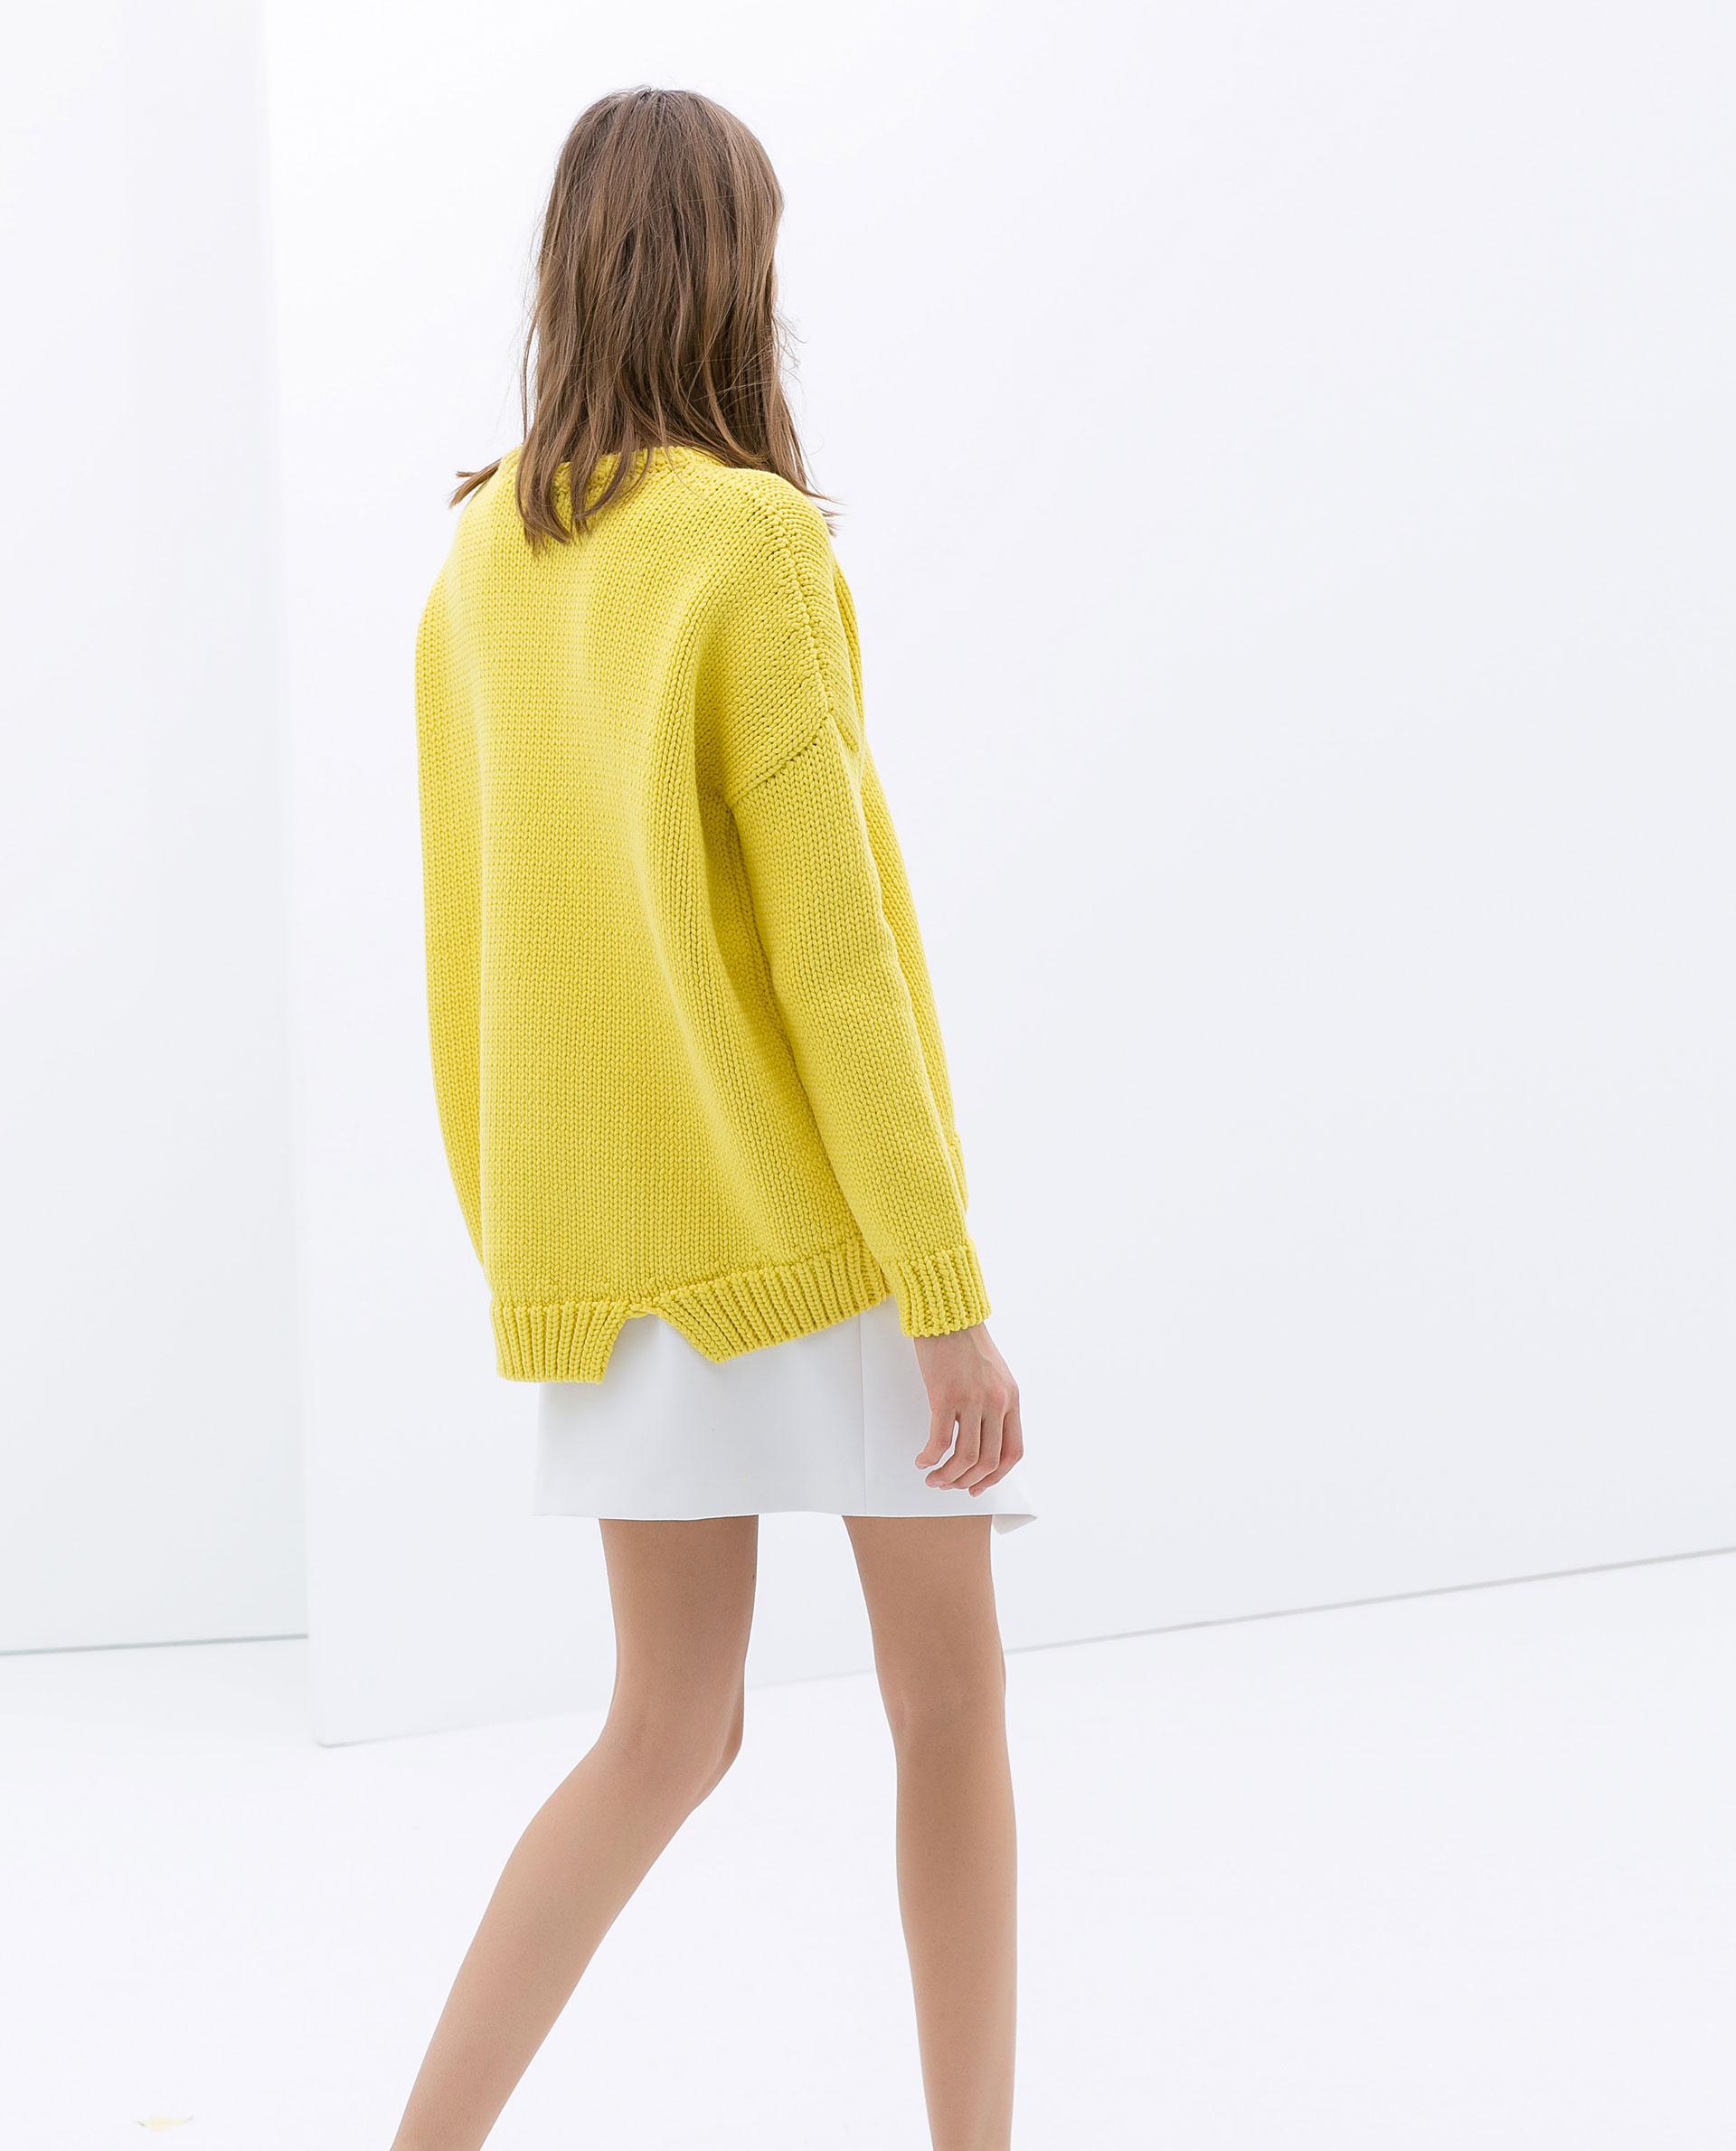 Zara Wrap Around Mini Skirt in White | Lyst